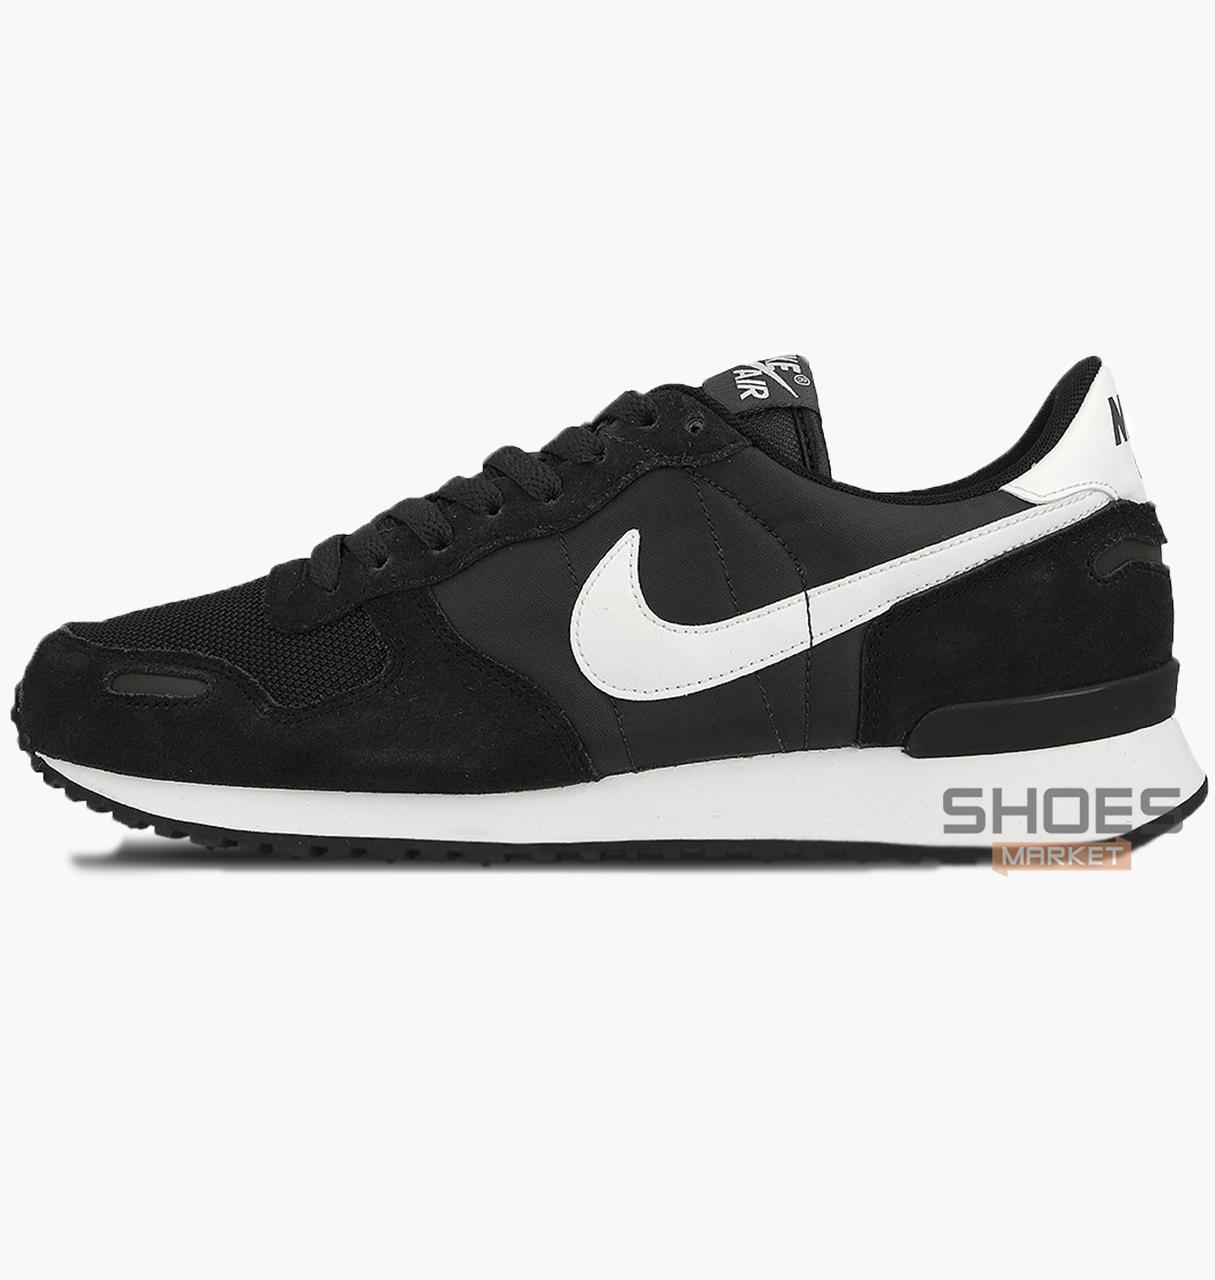 Мужские кроссовки Nike Air VRTX Black 903896-010, оригинал